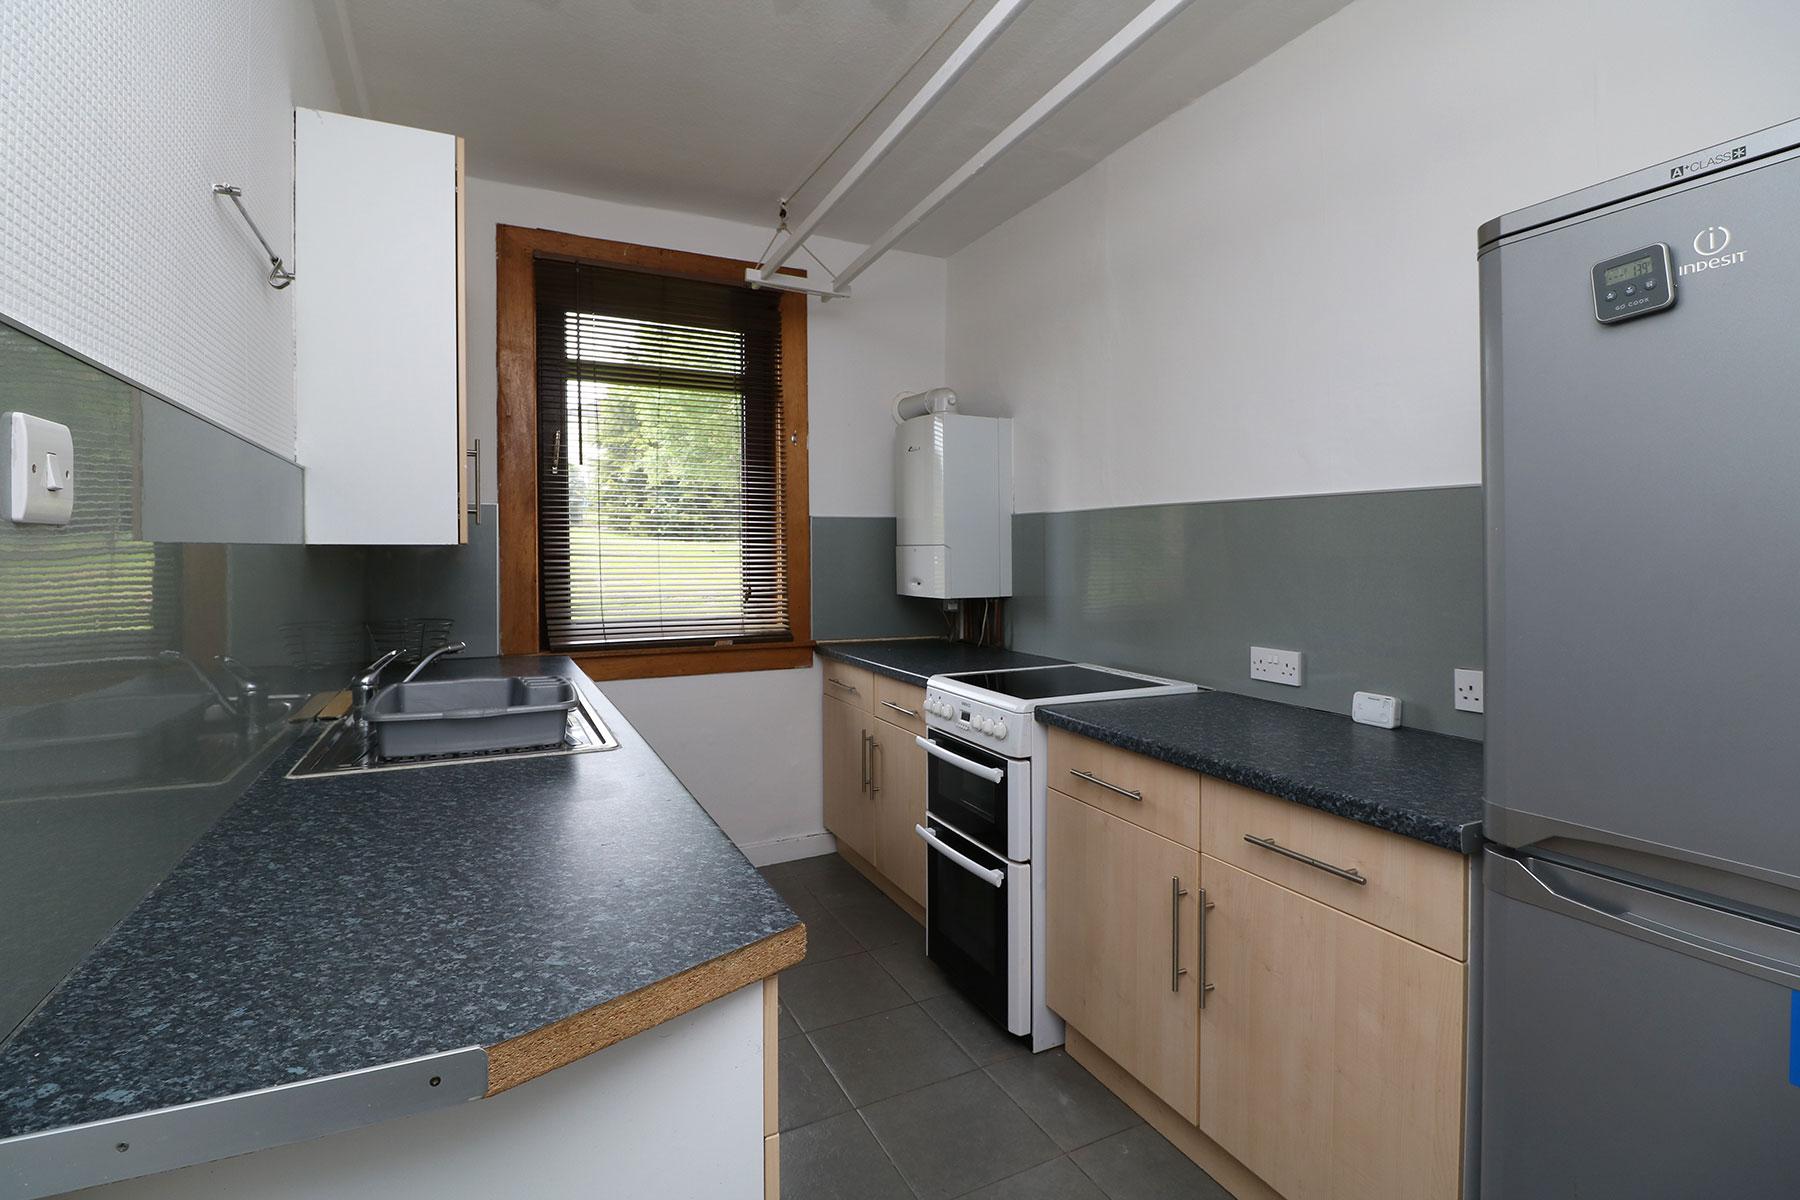 kerrsview-terrace-kitchen.jpg